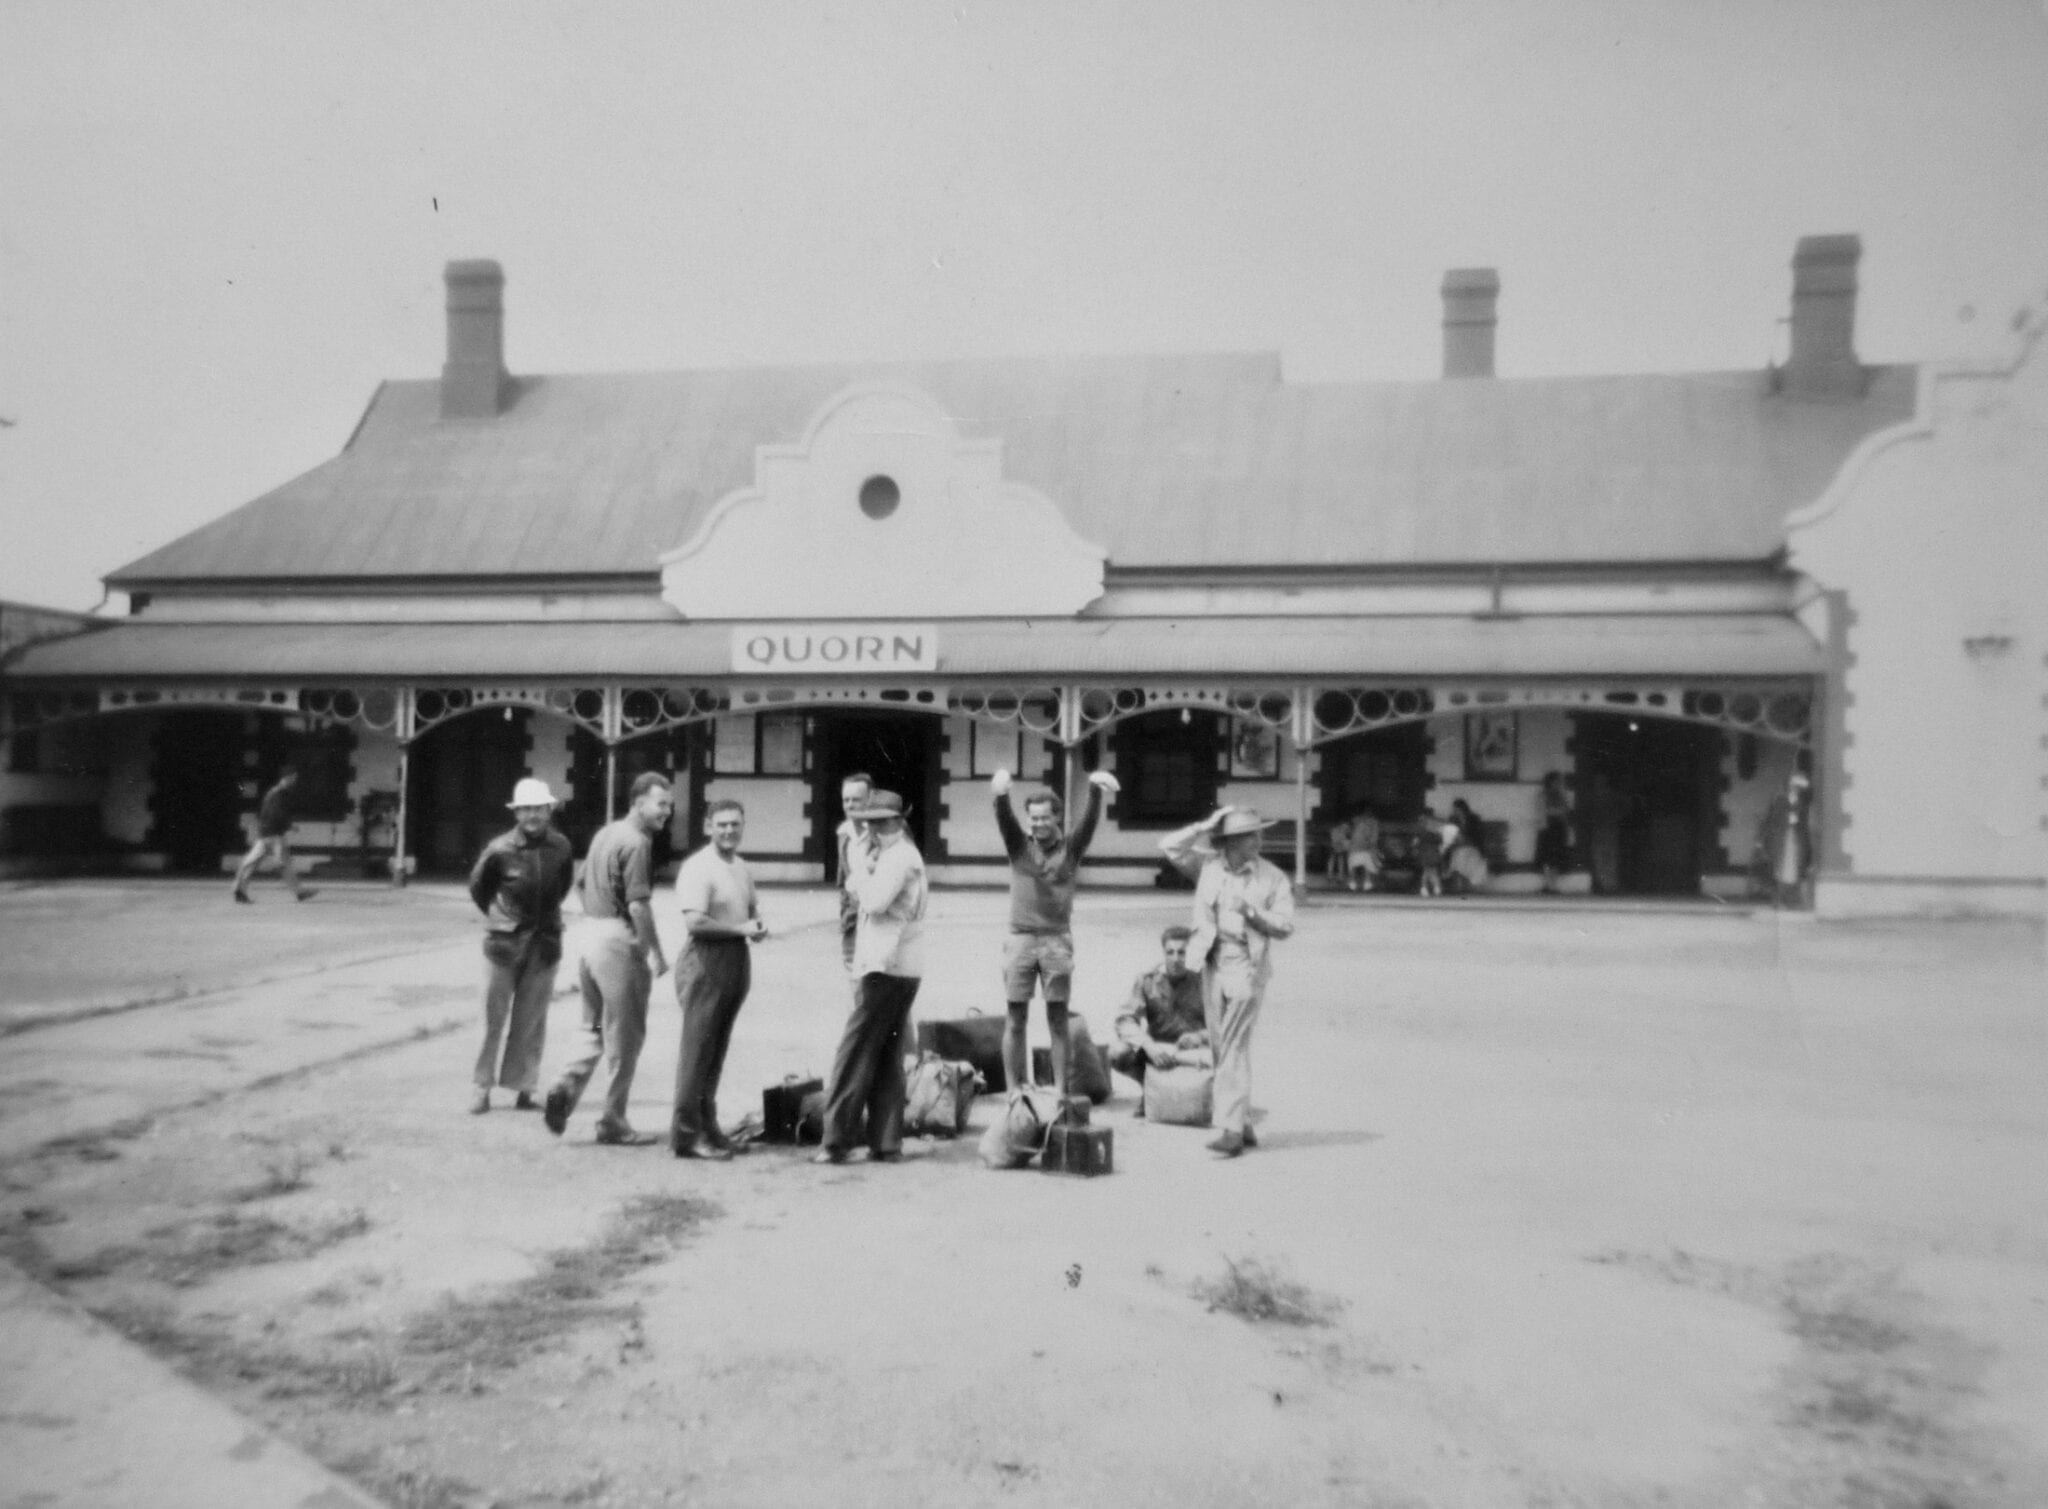 Natmap crew outside railway station at Quorn SA, 1950.